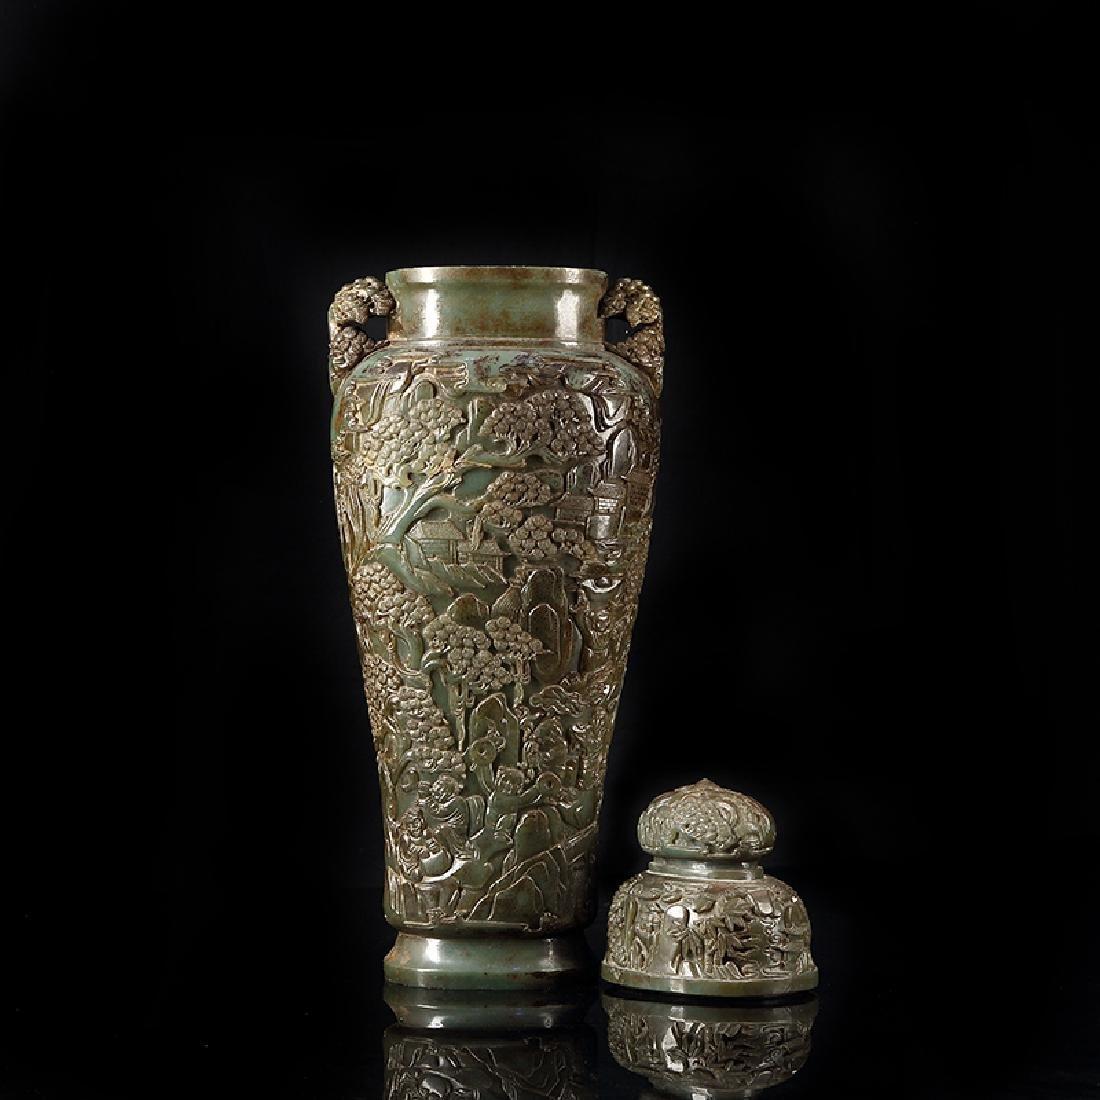 Large Chinese Qing Dynasty Hetian Jade  Vase - 3